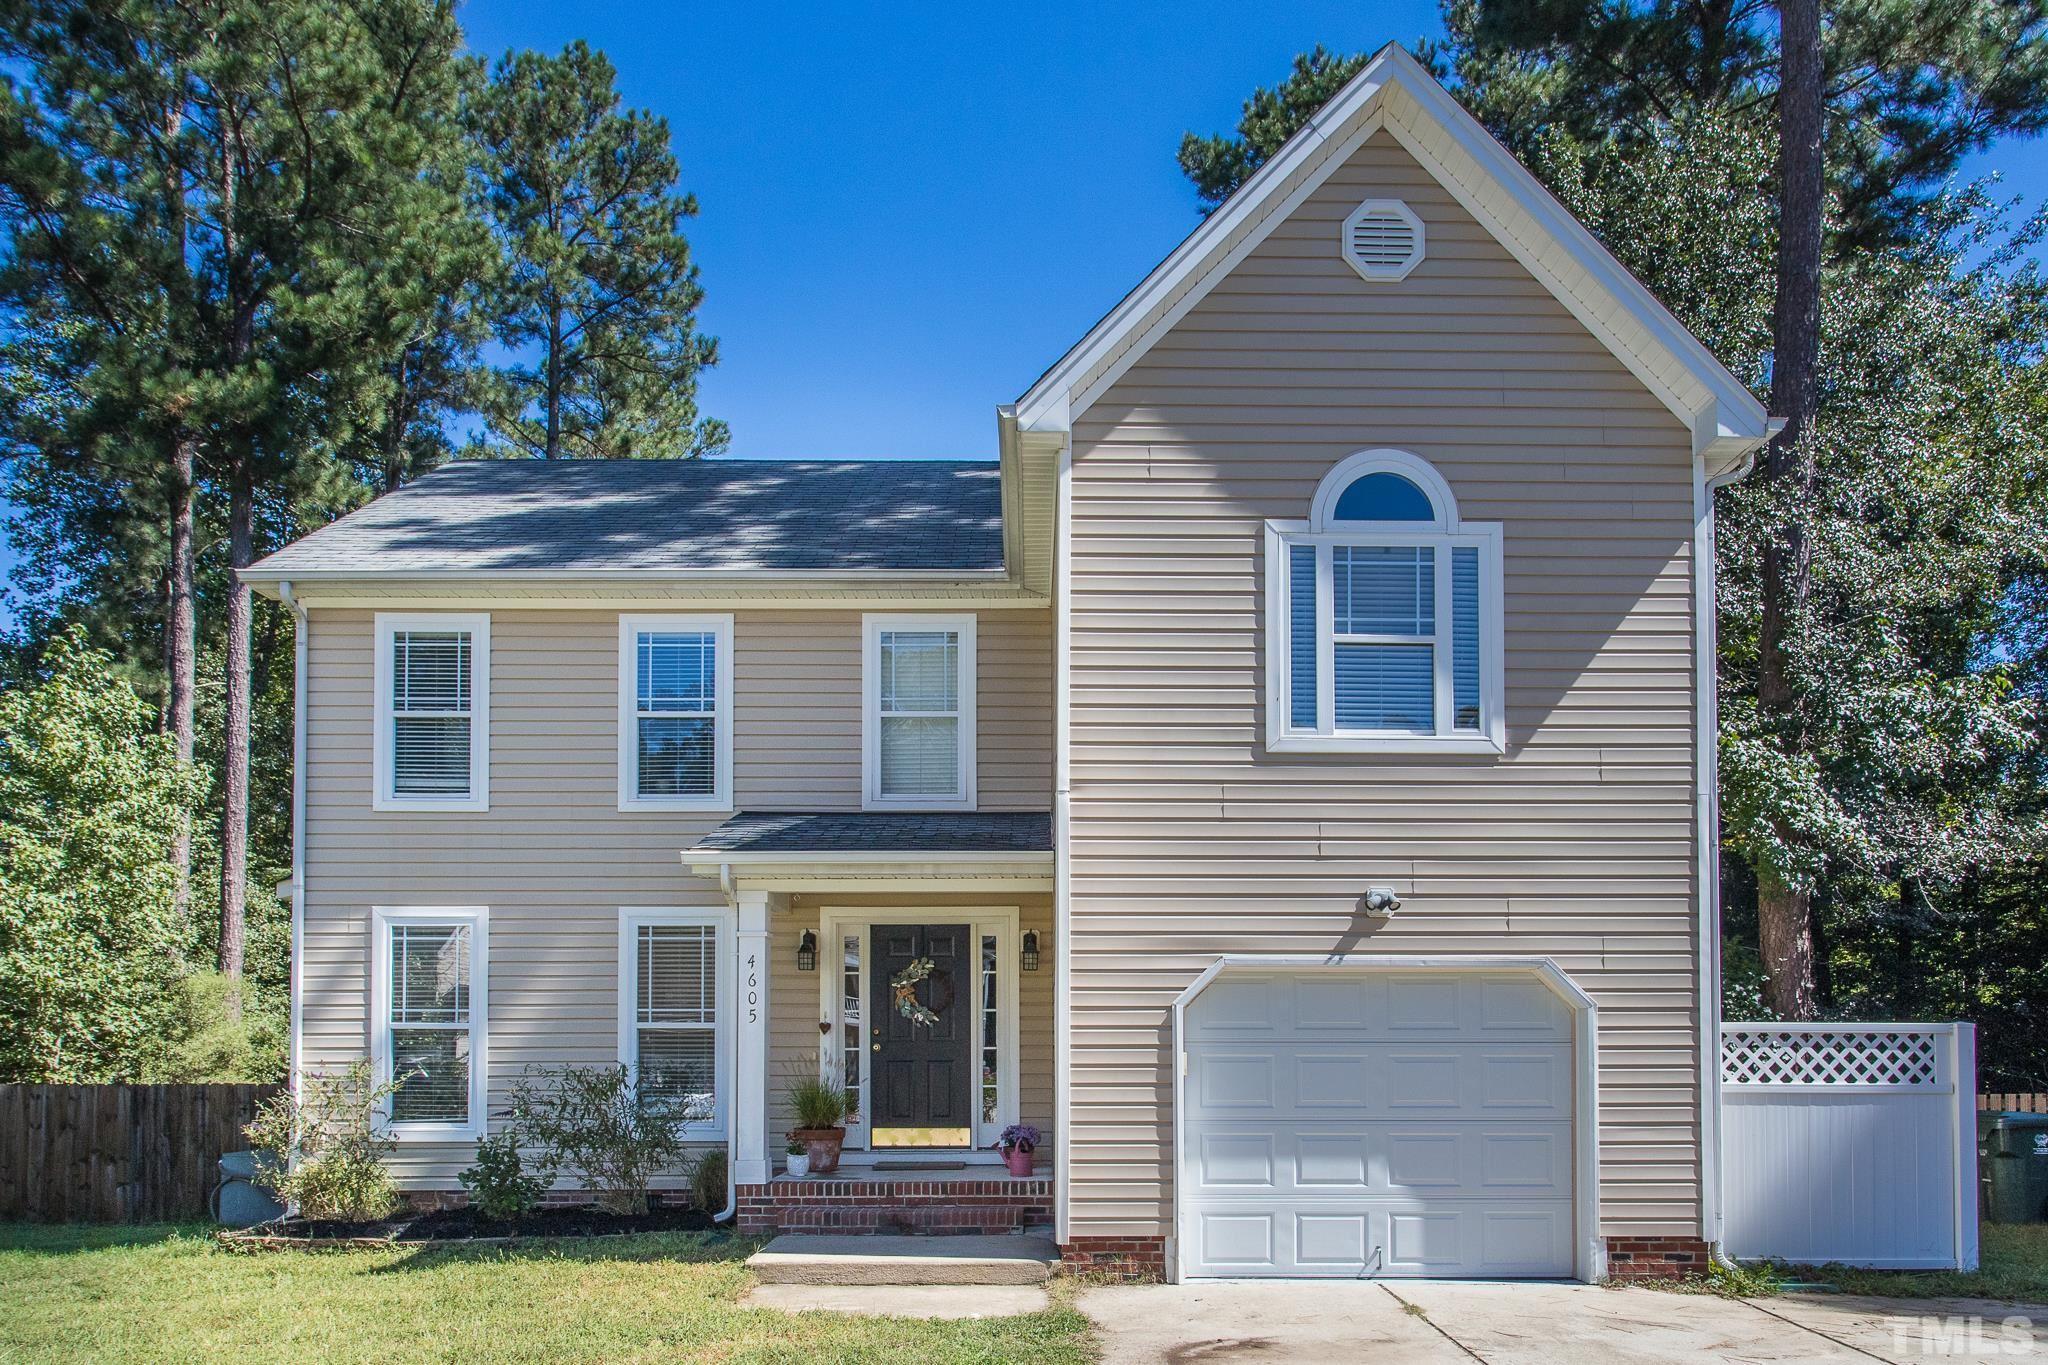 4605 Landover Crest Drive, Raleigh, NC 27616